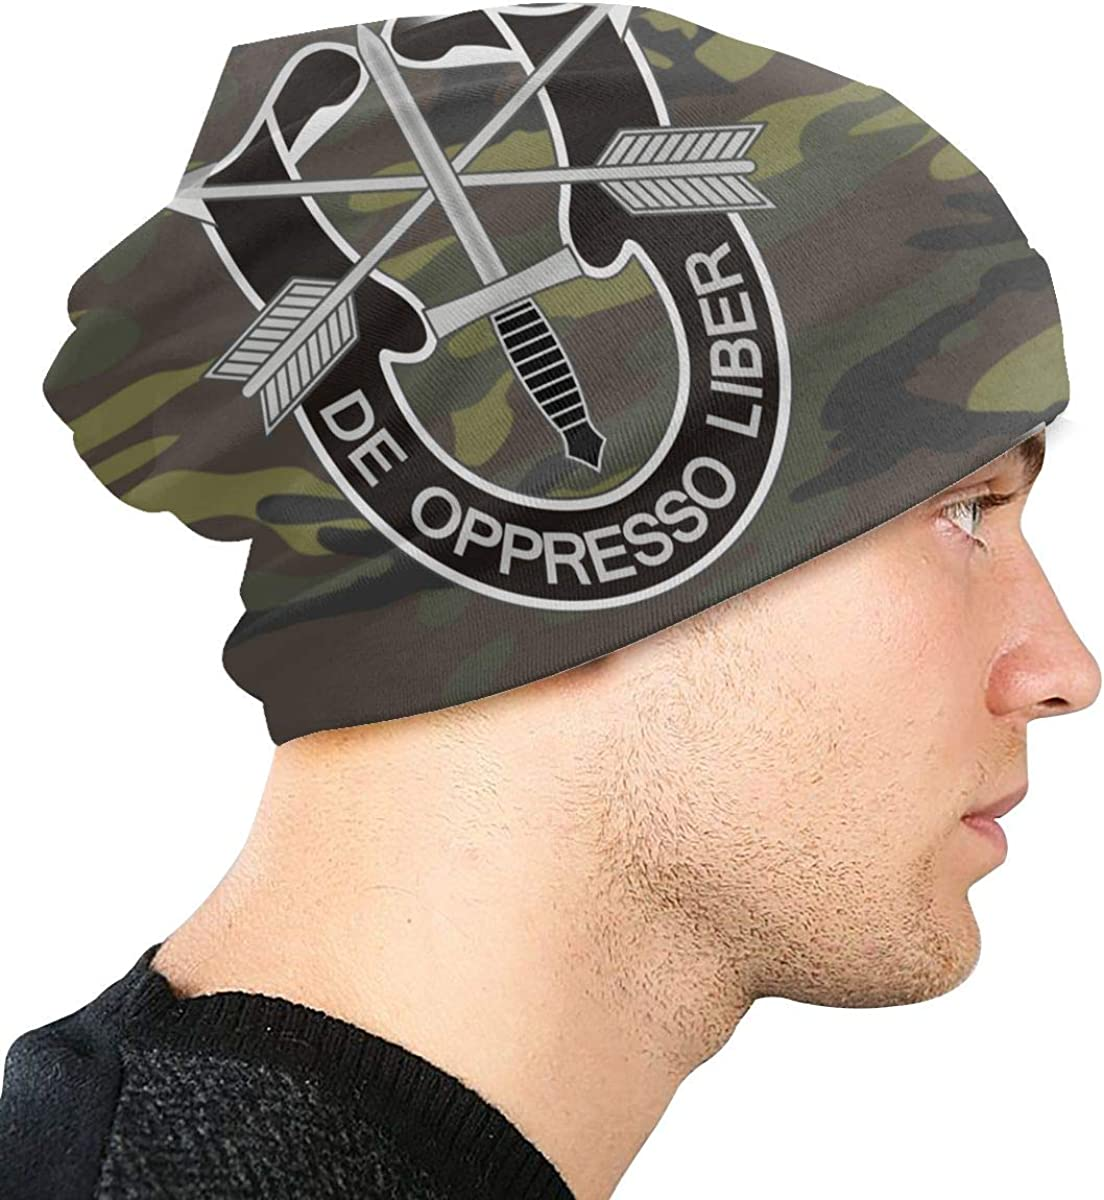 De Oppresso Liber Unisex Warm Hat Knit Hat Skull Cap Beanies Cap